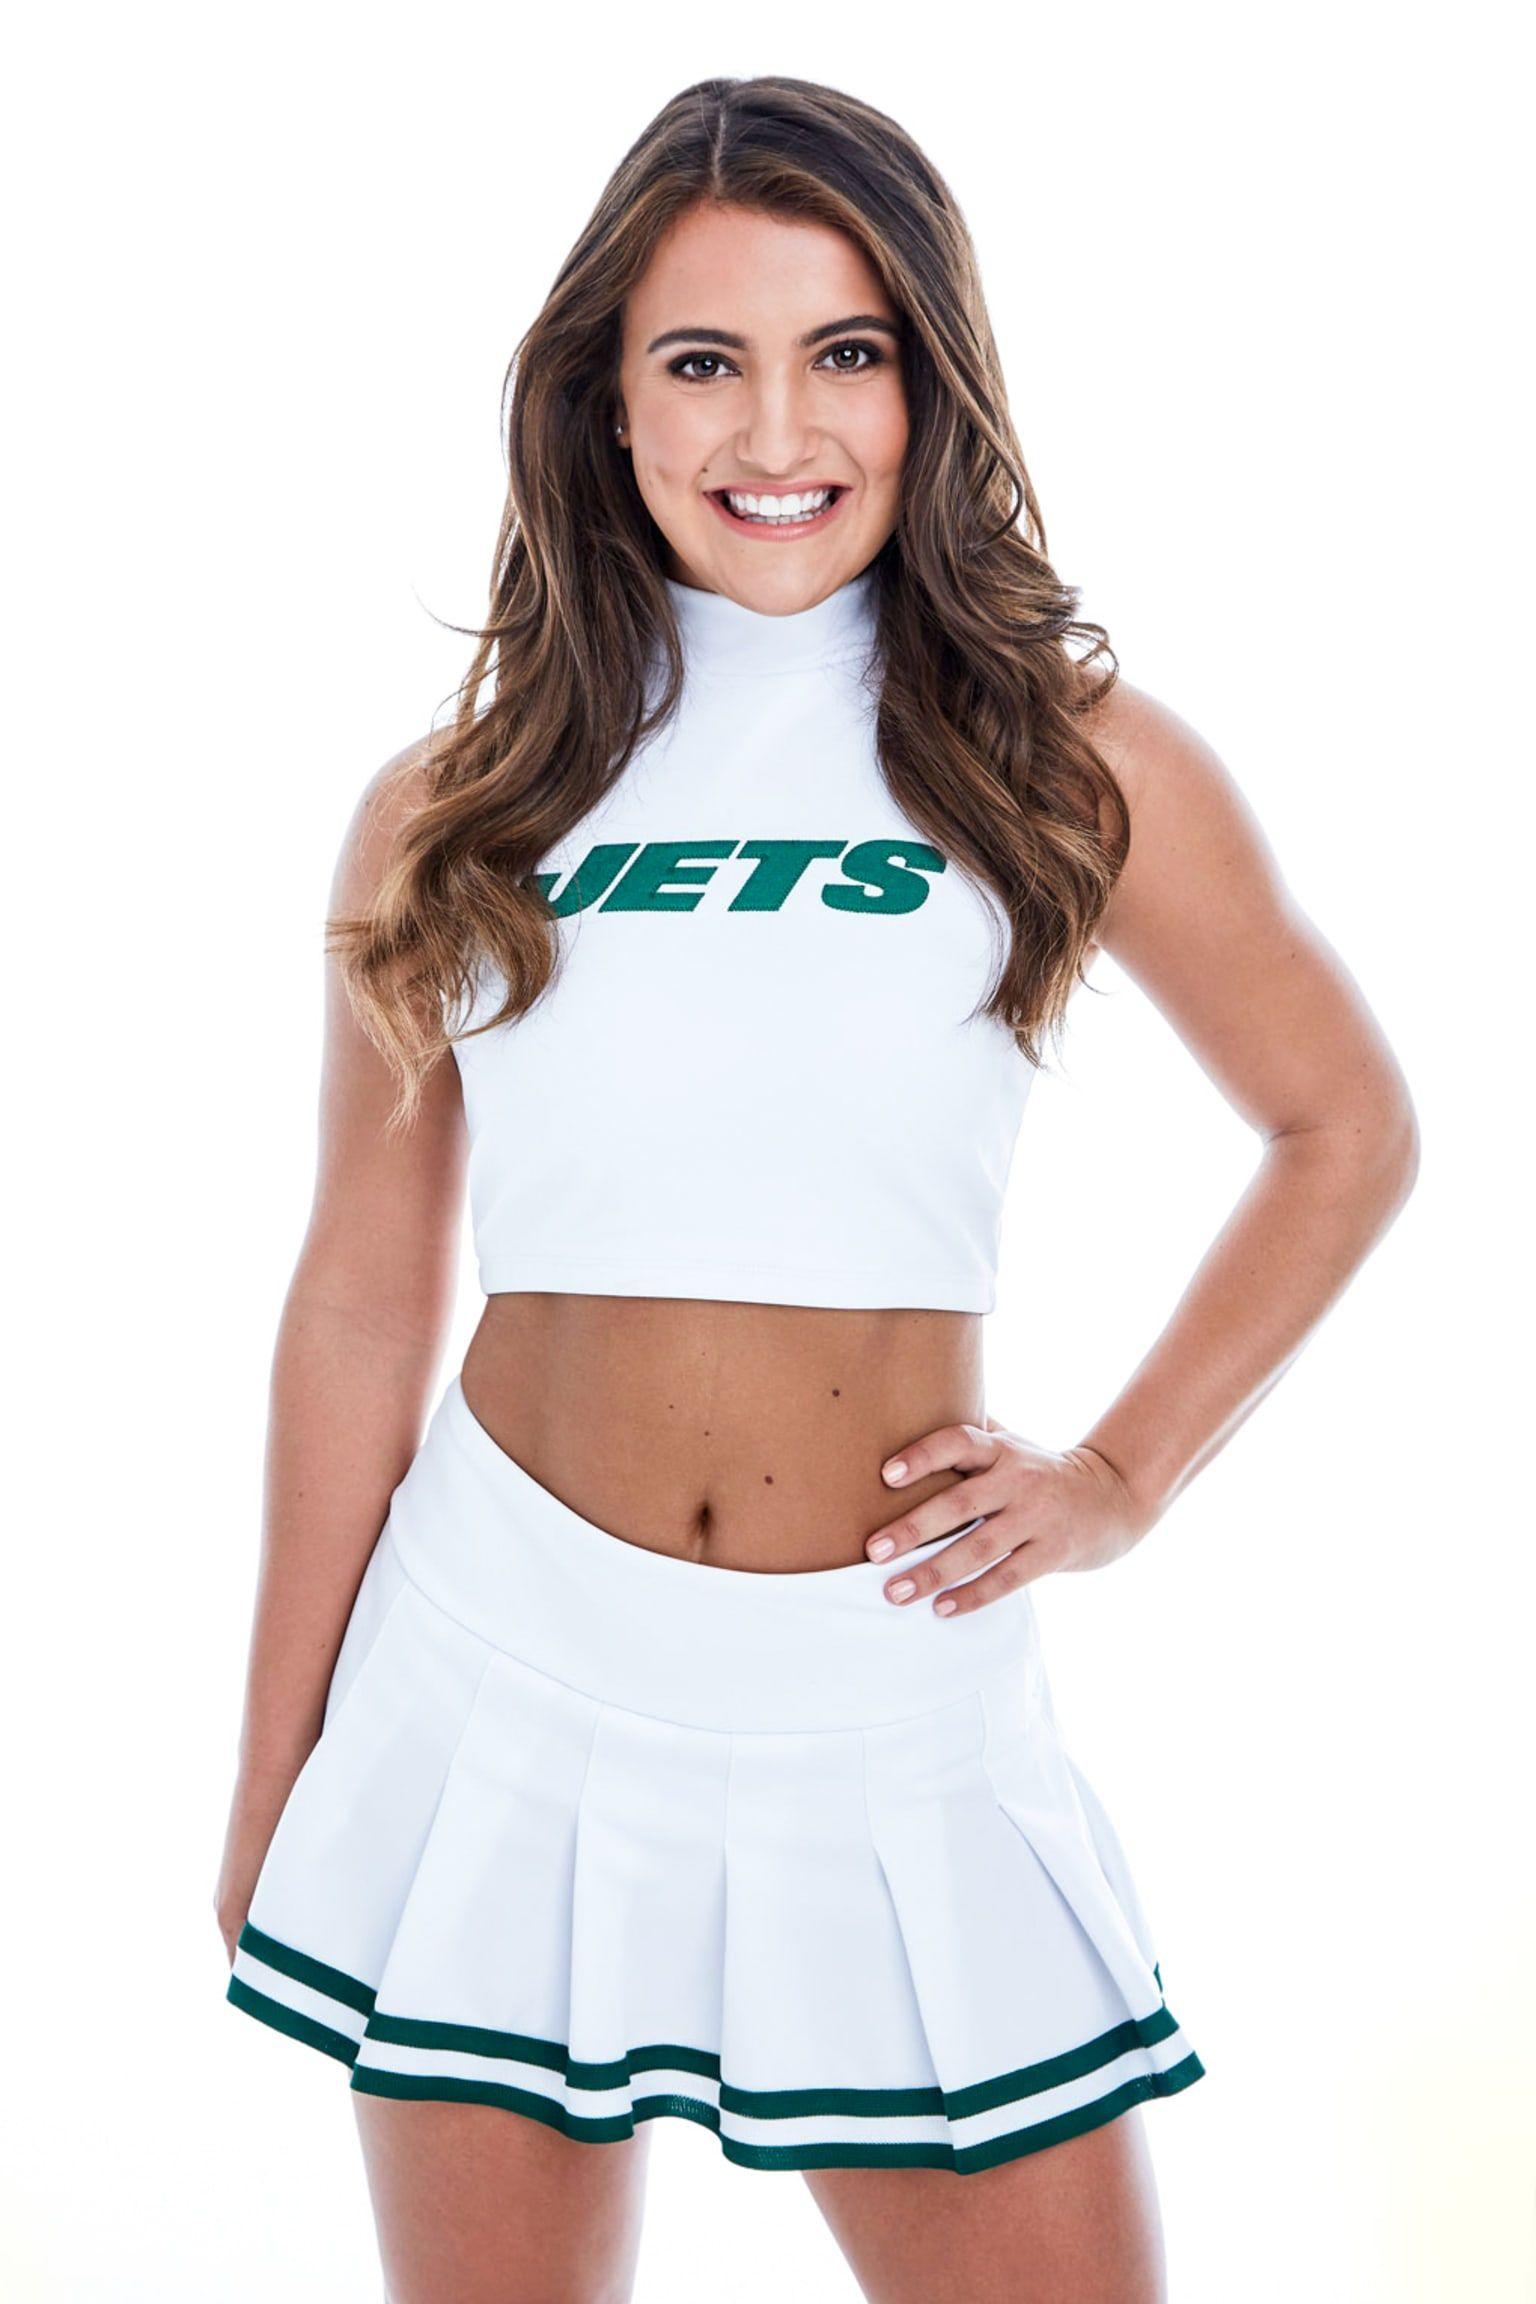 New York Jets Flight Crew Roster In 2020 New York Jets Jets Cheerleaders Professional Cheerleaders